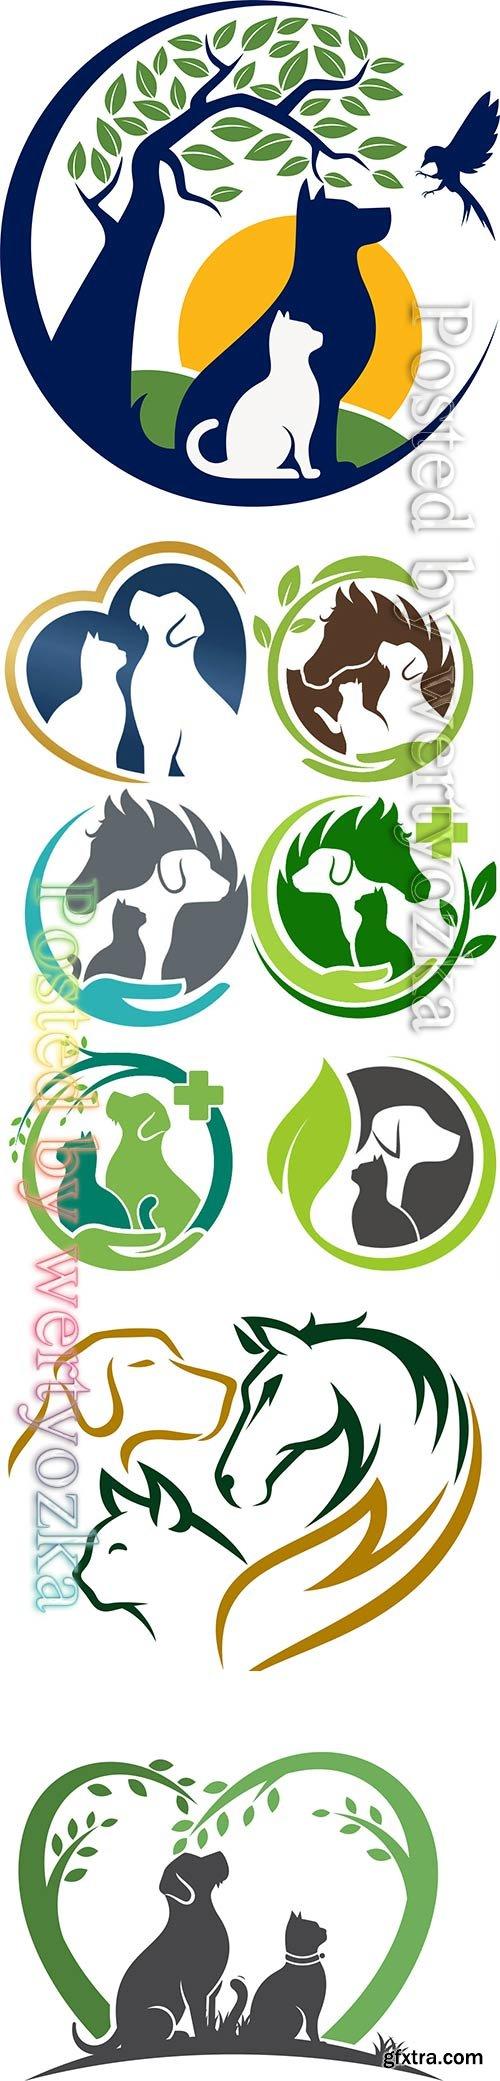 Logo collection vector illustration # 6